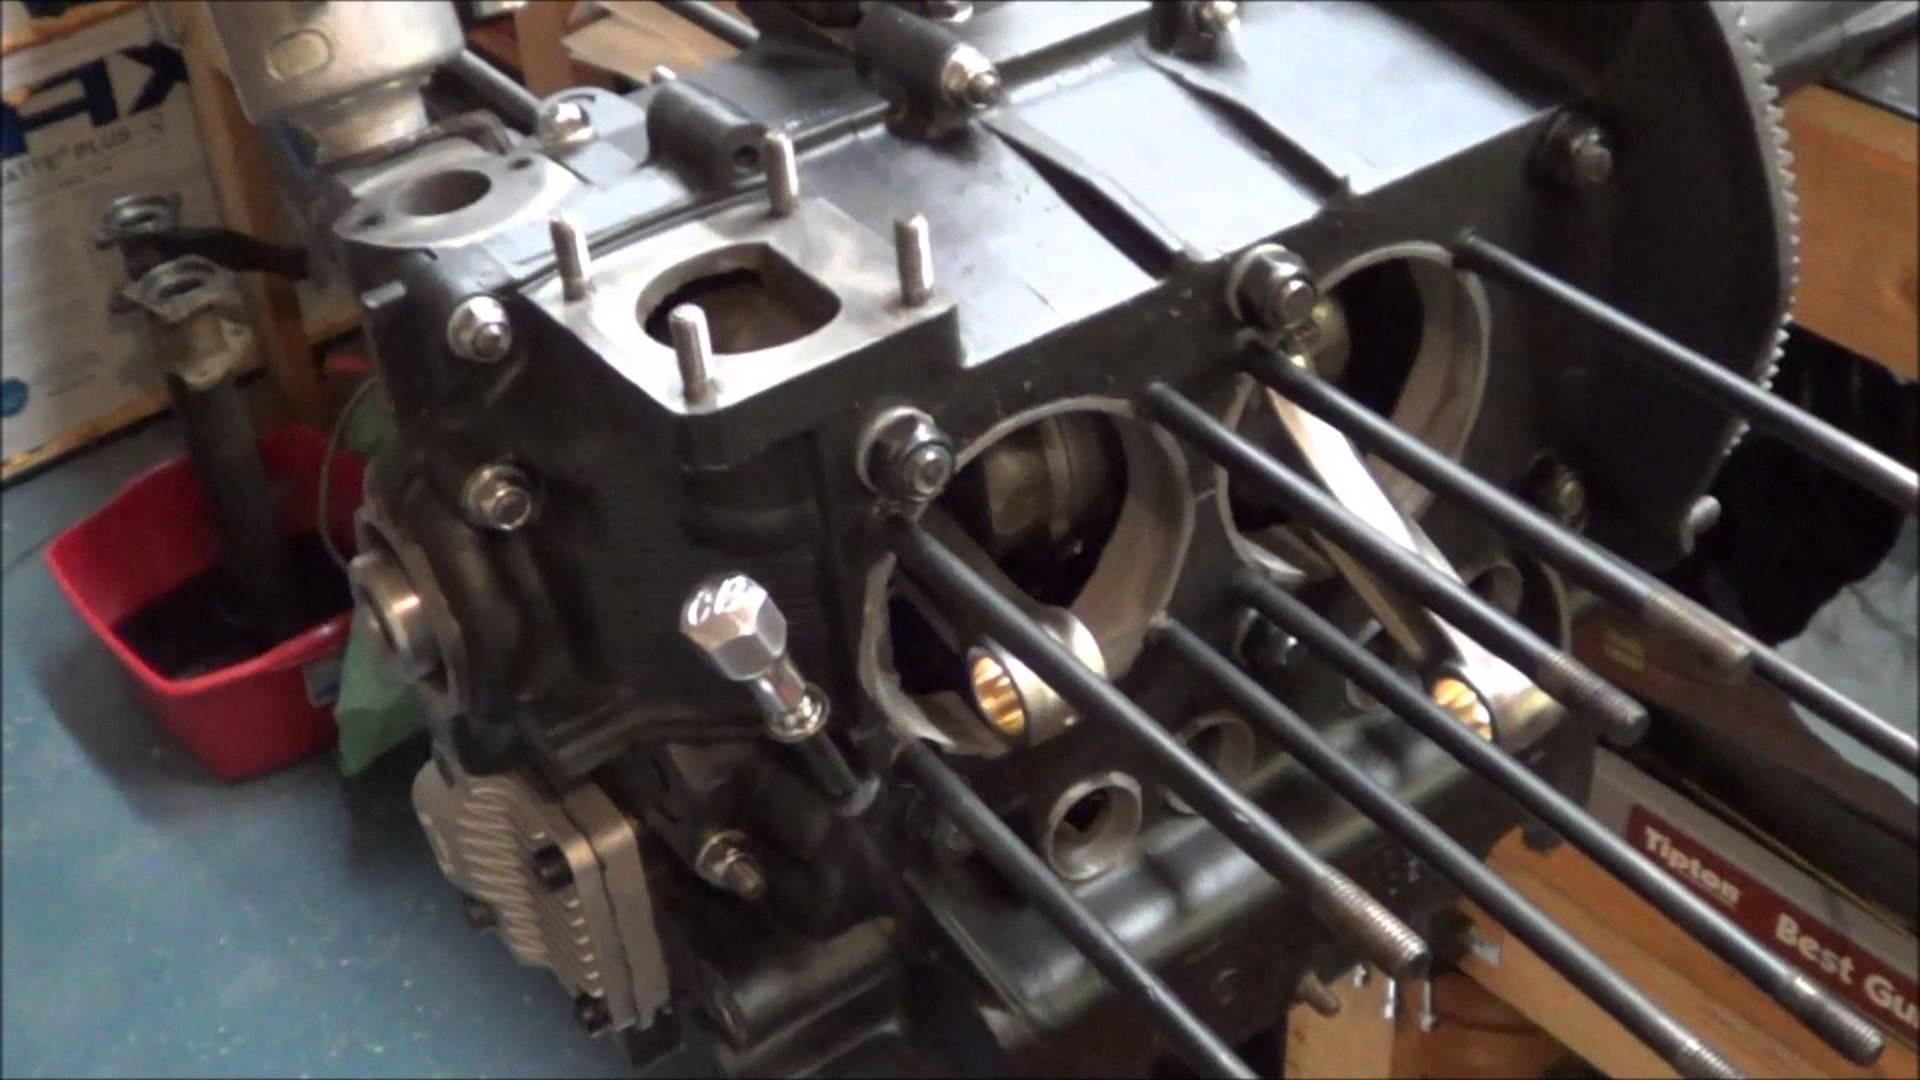 1600cc Vw Engine Diagram Vw Bug Engine Rebuild Of 1600cc Vw Engine Diagram